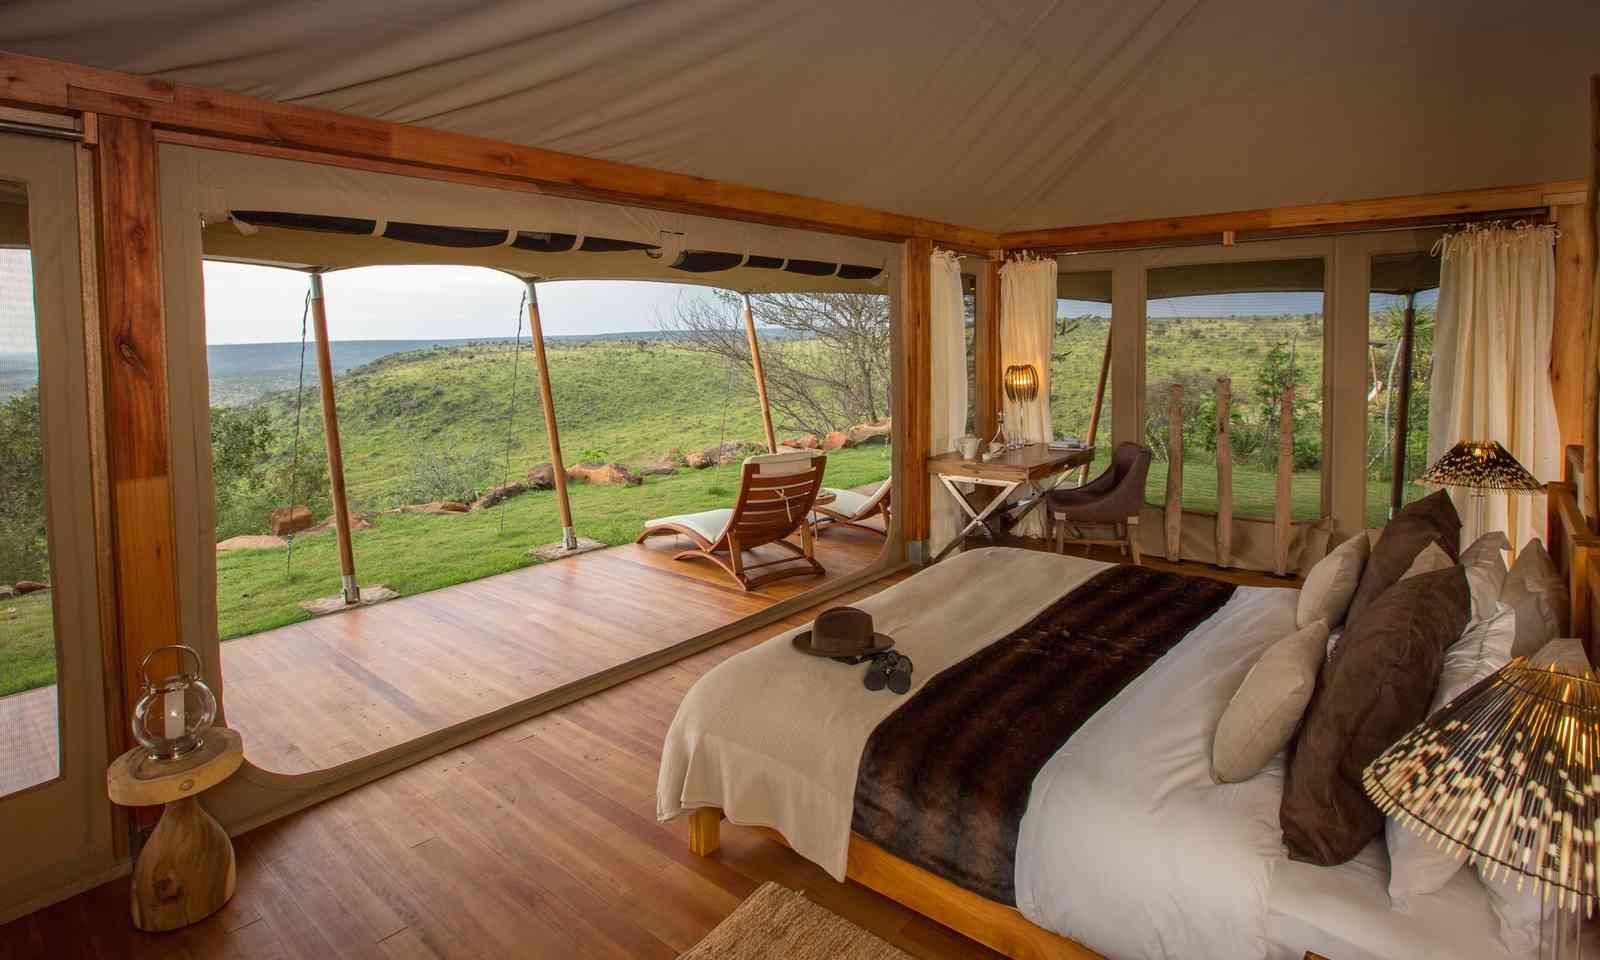 Loisaba Tented Camp (Loisaba.com)